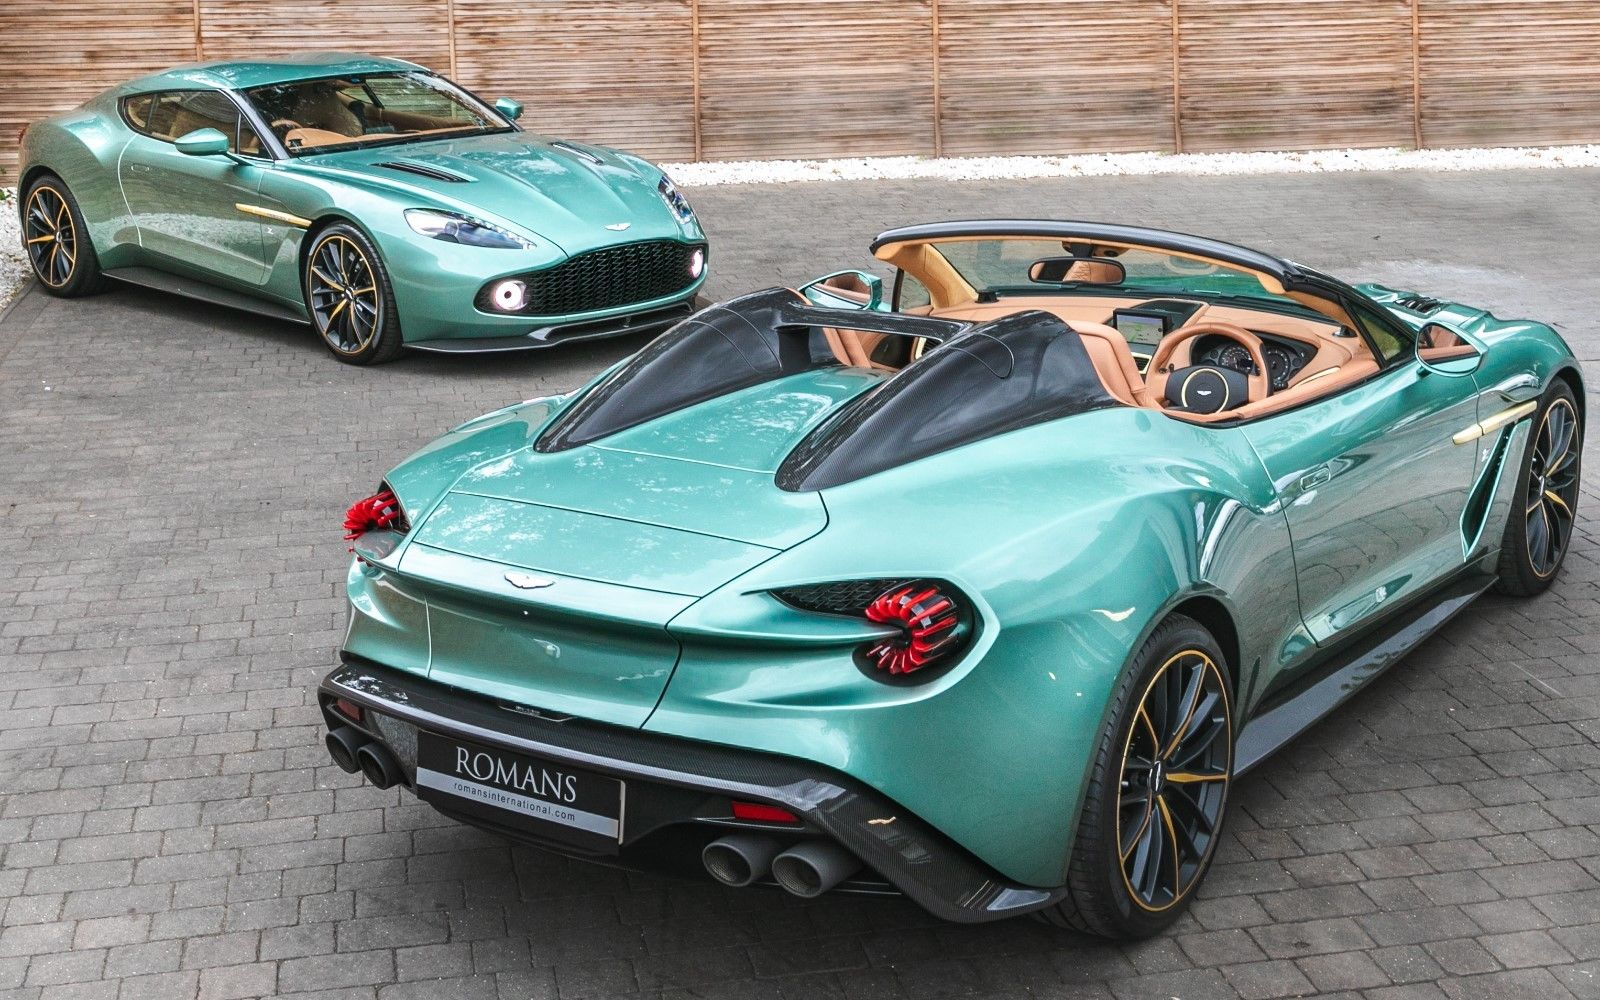 Aston Martin Vanquish Zagato Coupe Luxury Pulse Cars United Kingdom For Sale On Luxurypulse